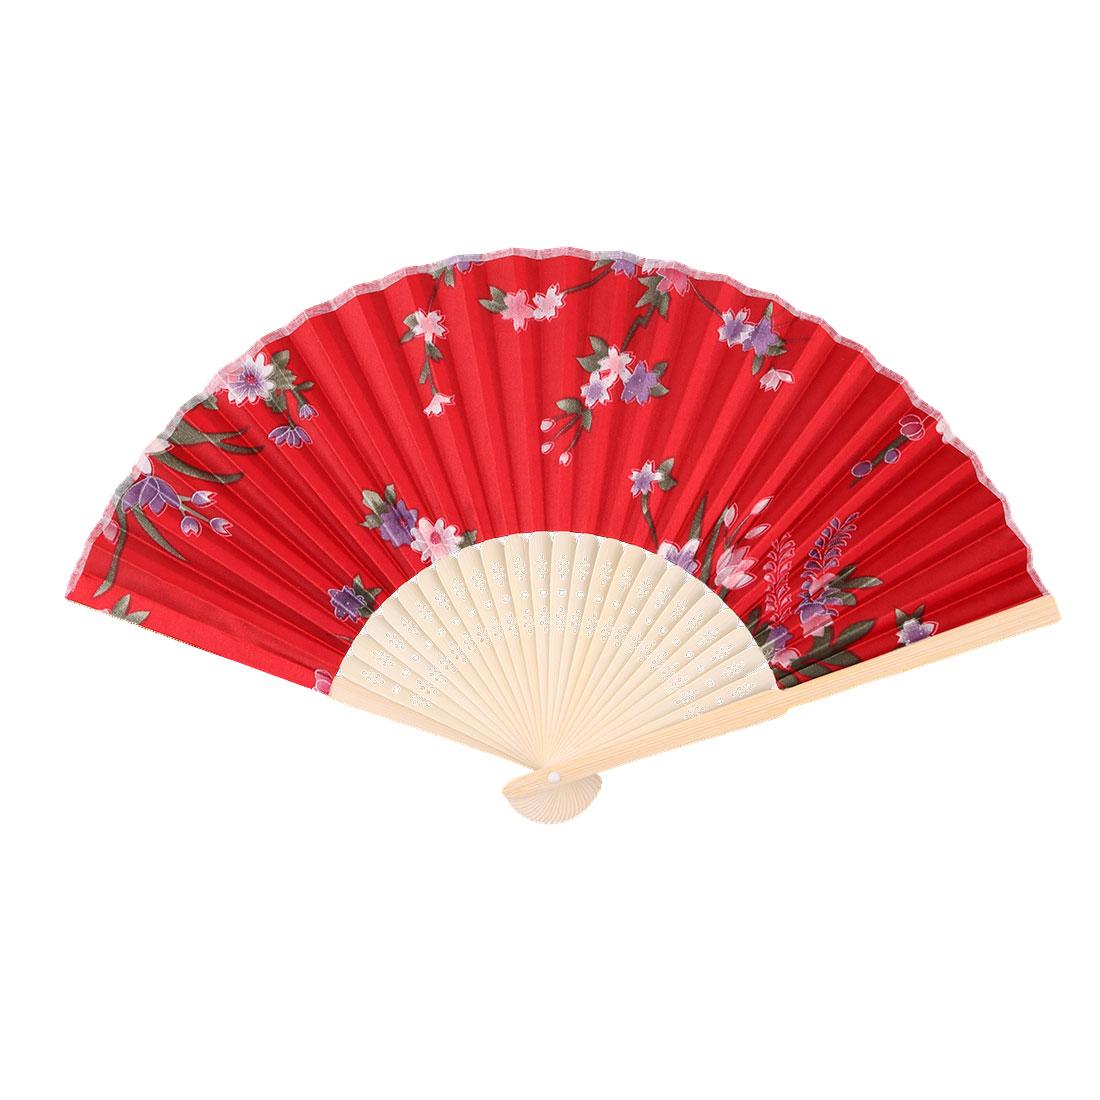 Lady Summer Bamboo Frame Flower Pattern Handmade Craft Folding Dancing Hand Fan